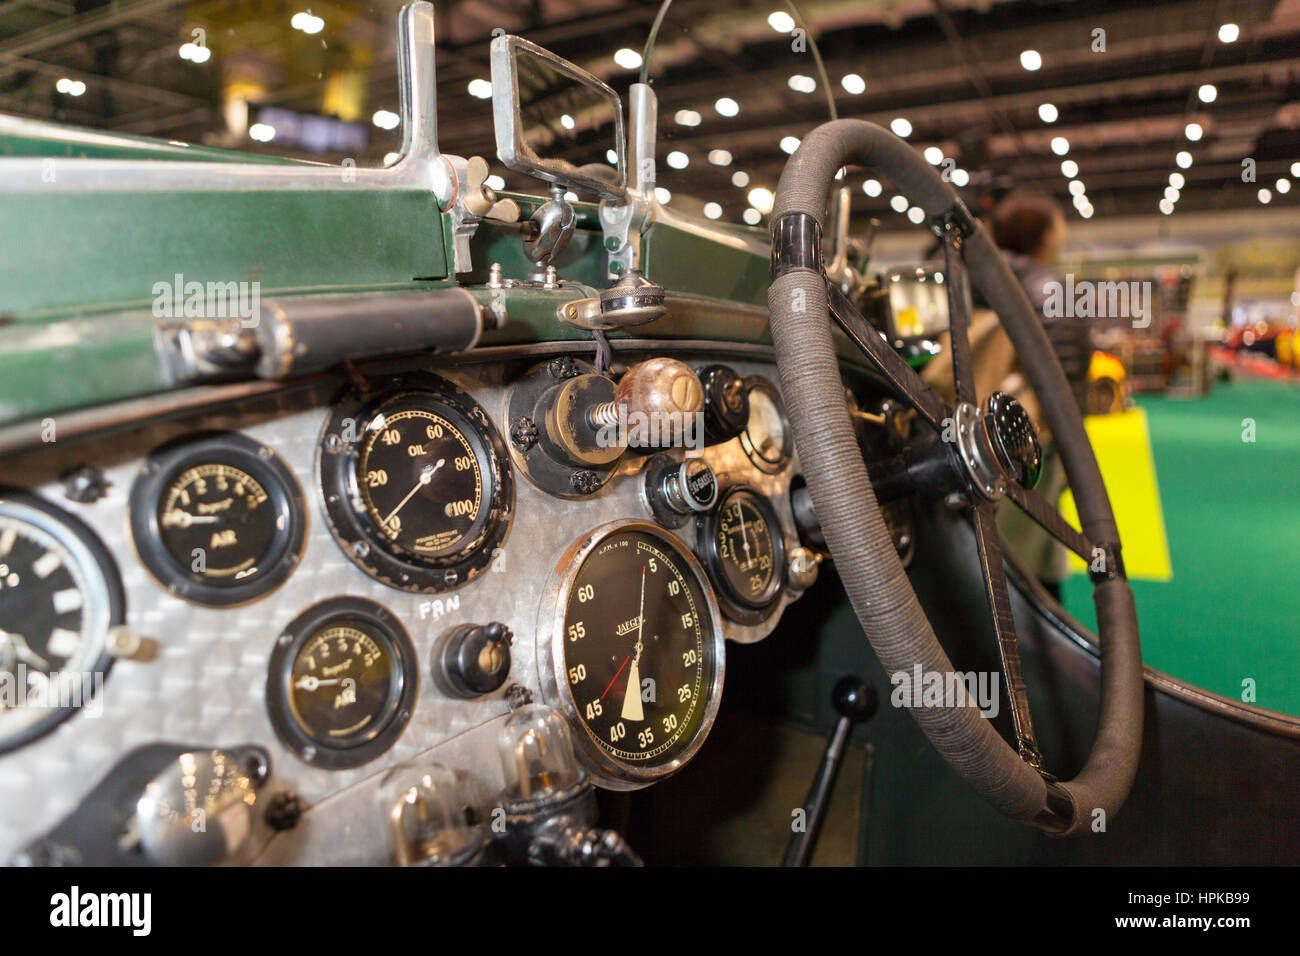 London, UK. 23. Februar 2017.  Le-Mans-Legende Jacky Ickx eröffnet ersten historischen Motorsport zeigen. ExCel, Stockbild